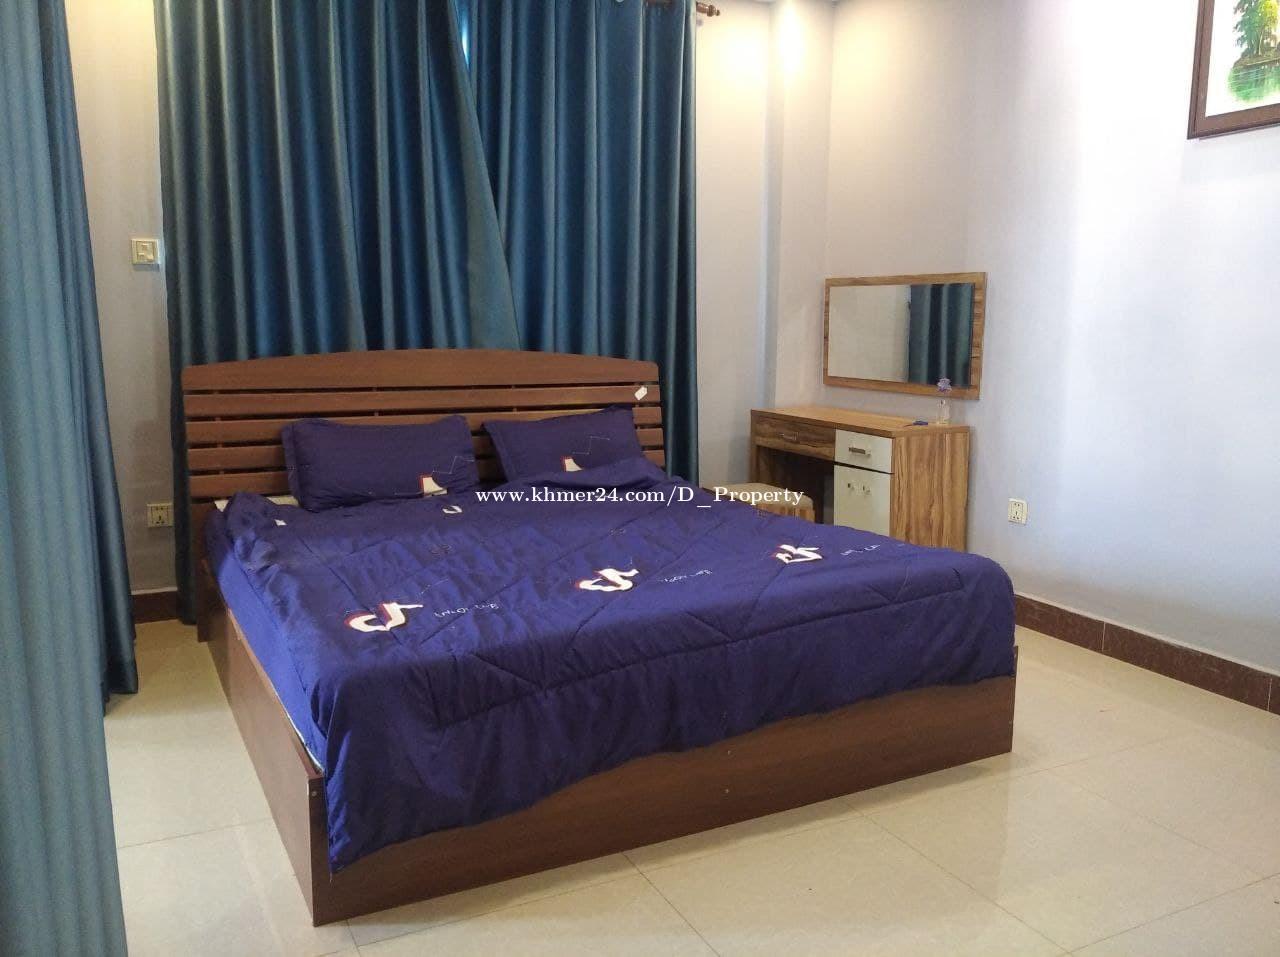 Nice Apartment for Rent (1Bedroom; Boeung Trobek)